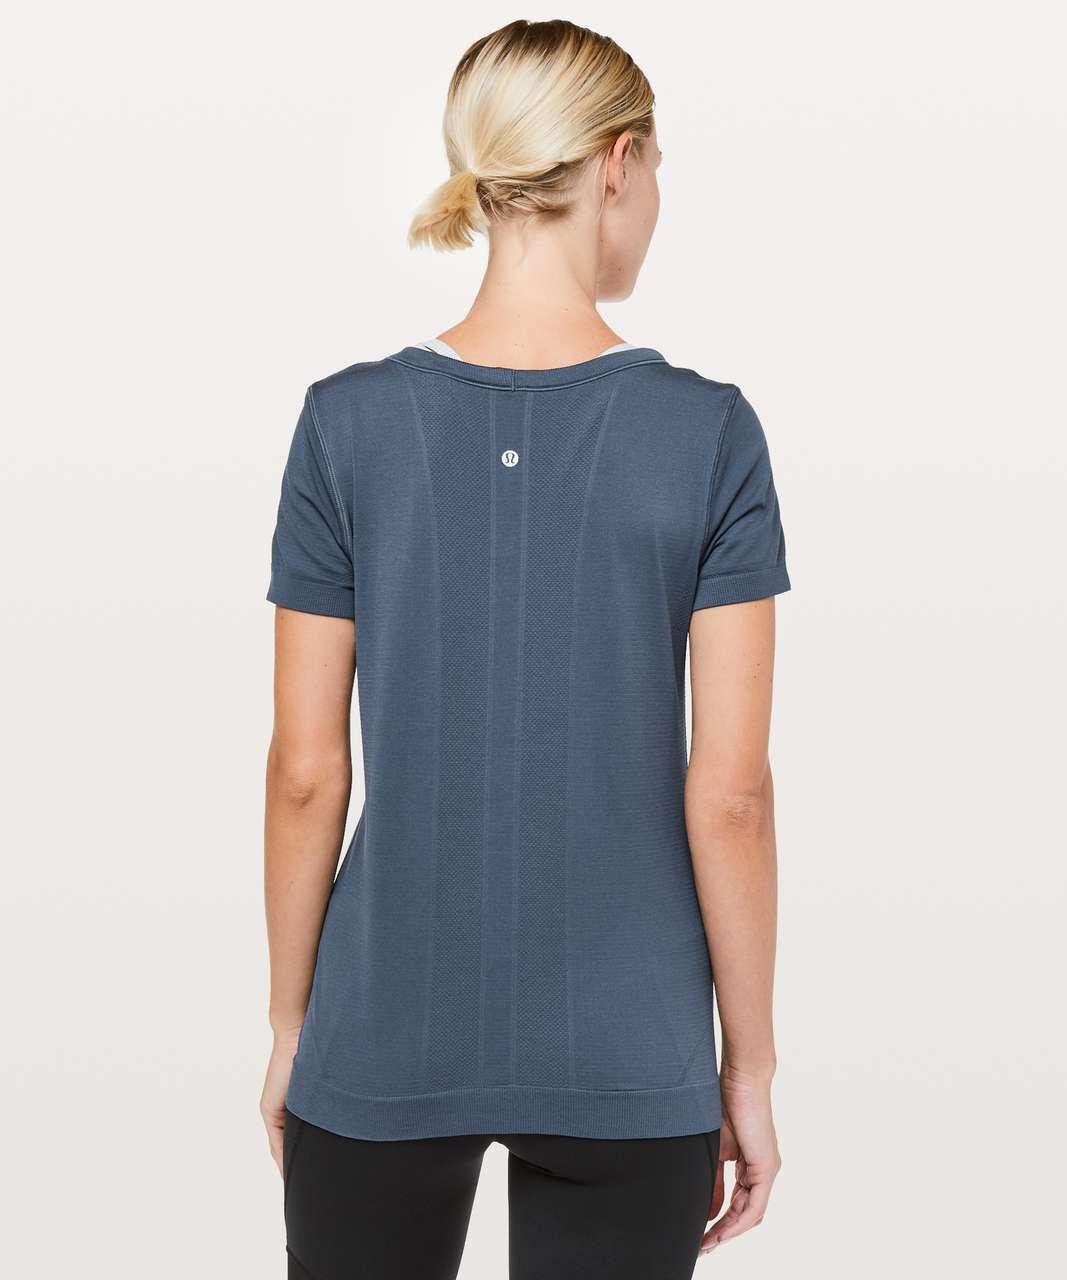 Lululemon Swiftly Tech Short Sleeve (Breeze) *Relaxed Fit - Thunder Blue / Thunder Blue